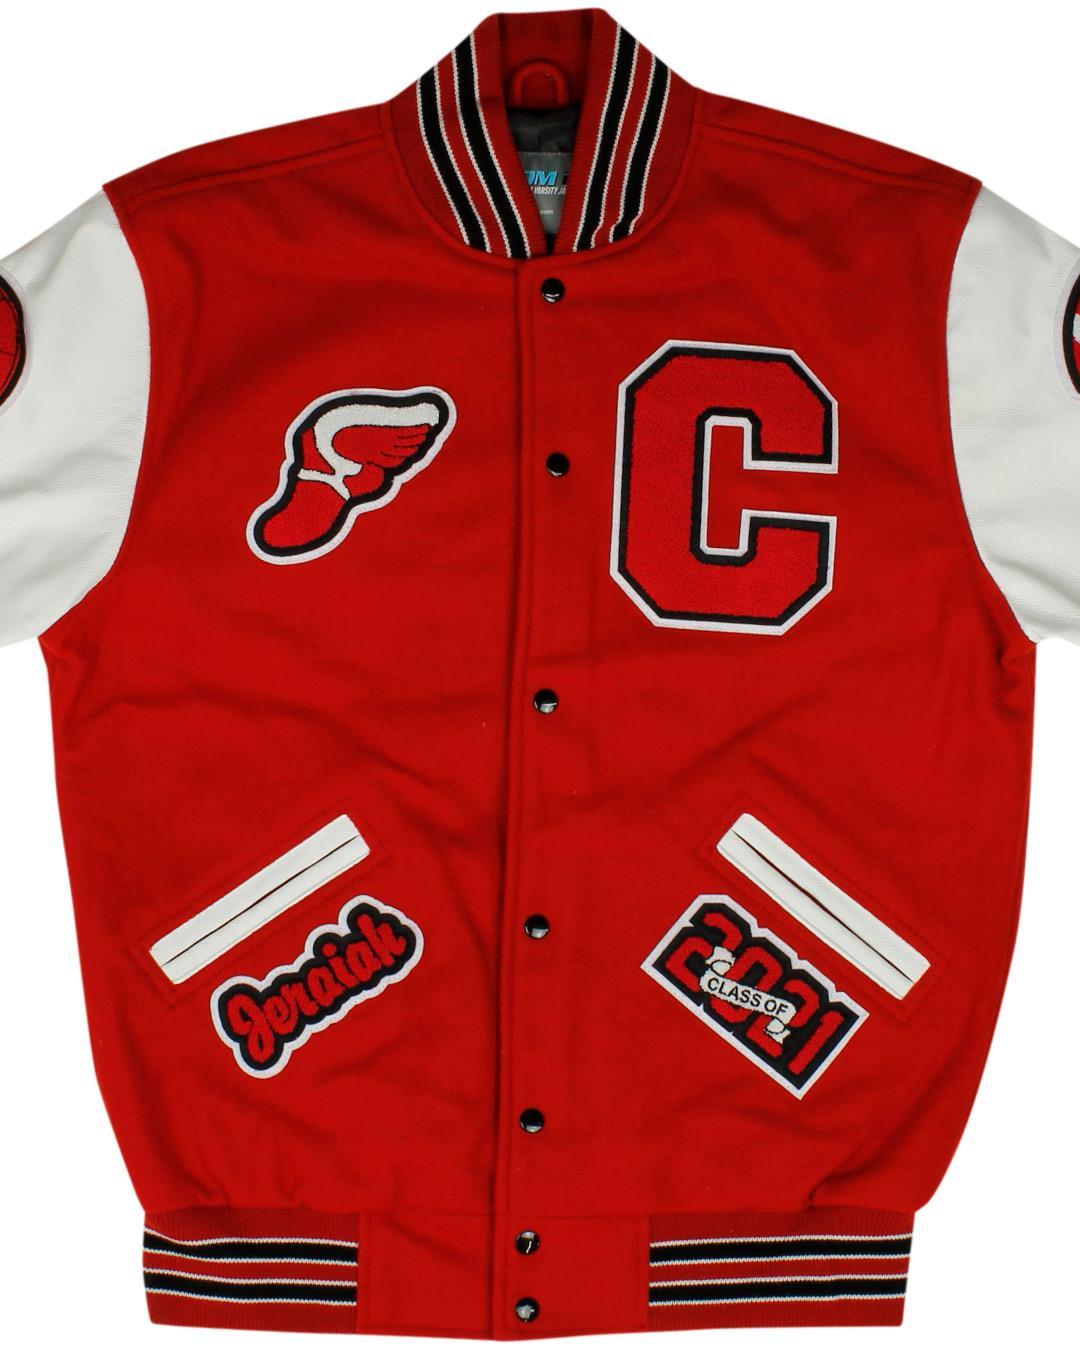 Cobre High School Letterman Jacket, Bayard NM - Front